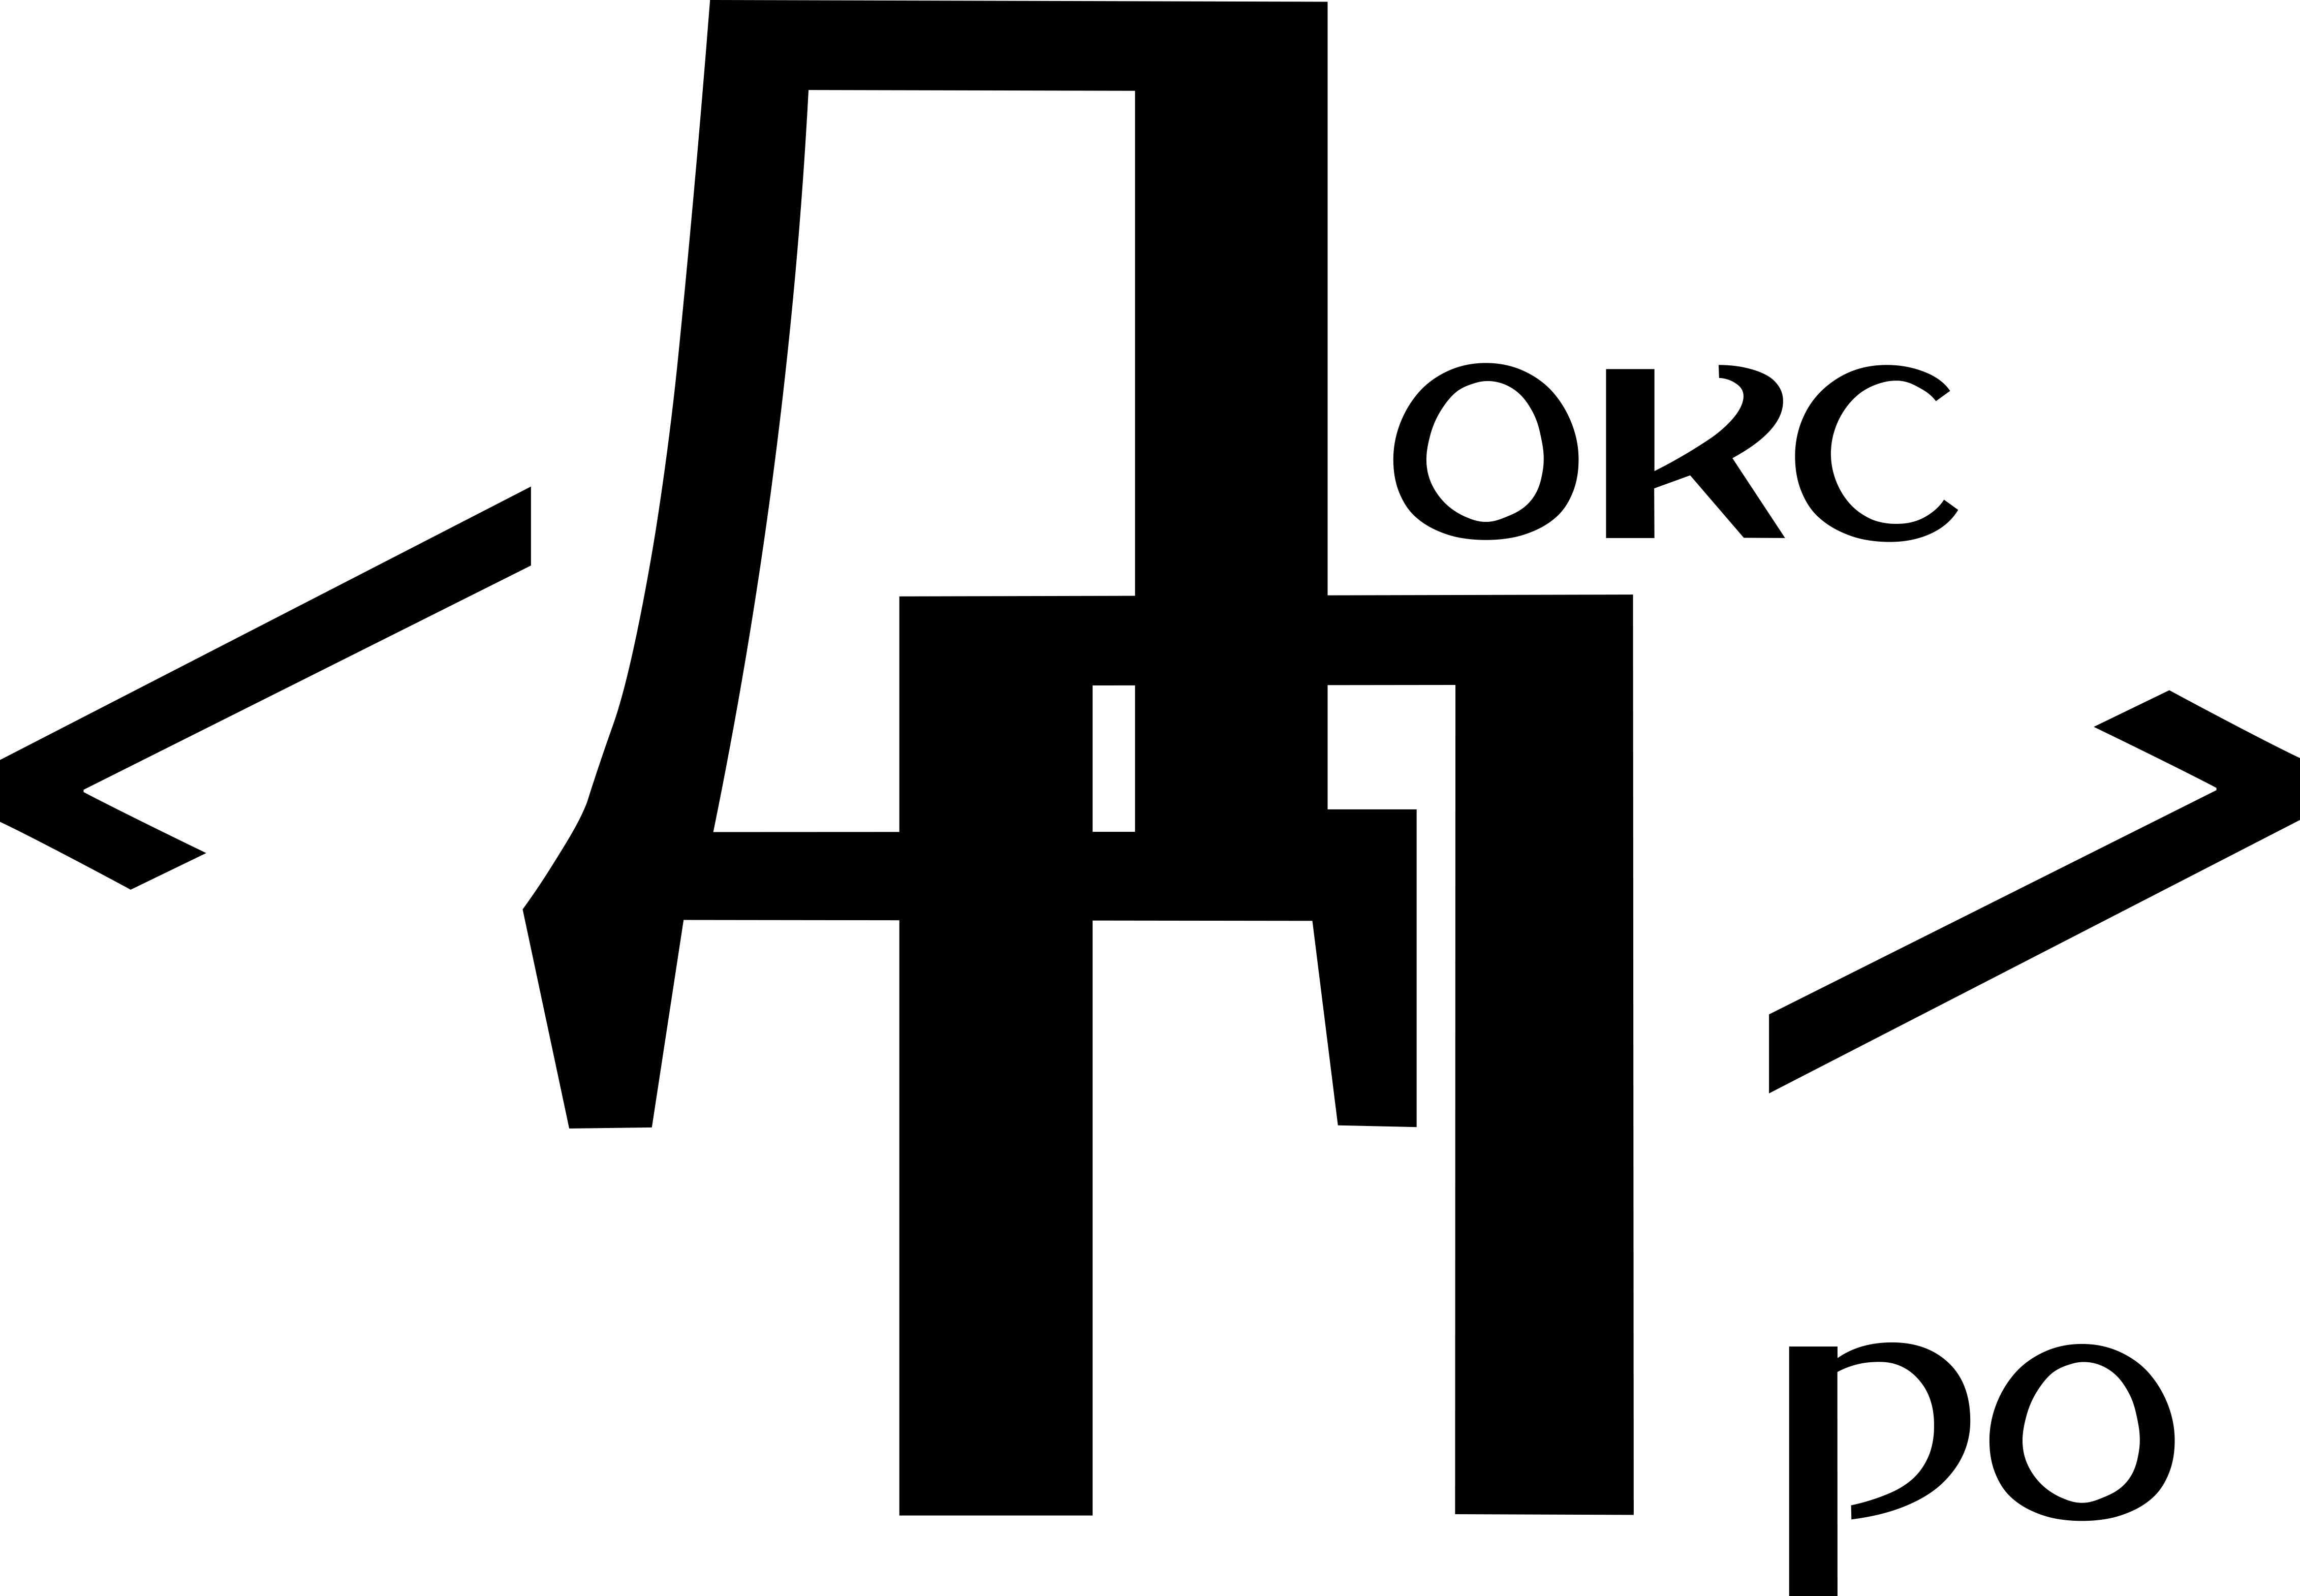 Разработка товарного знака/логотипа фото f_94559fb19761a307.jpg